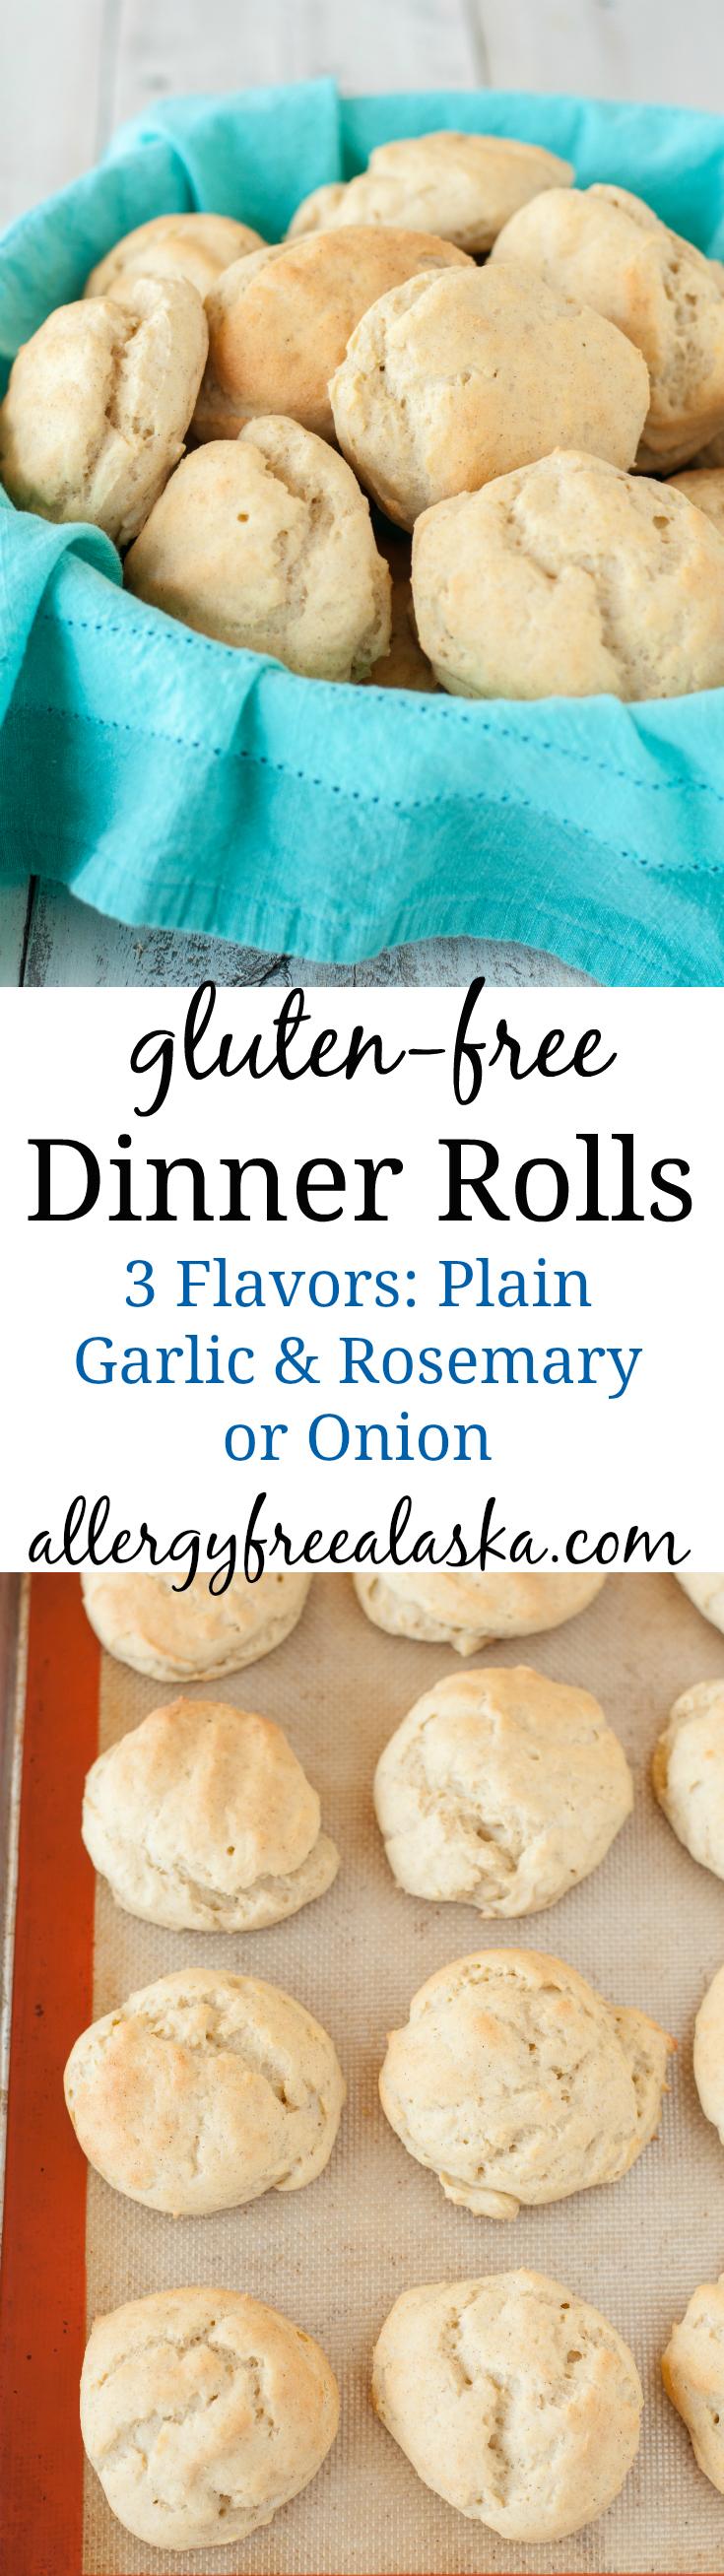 Gluten Free Dinner Rolls Recipe